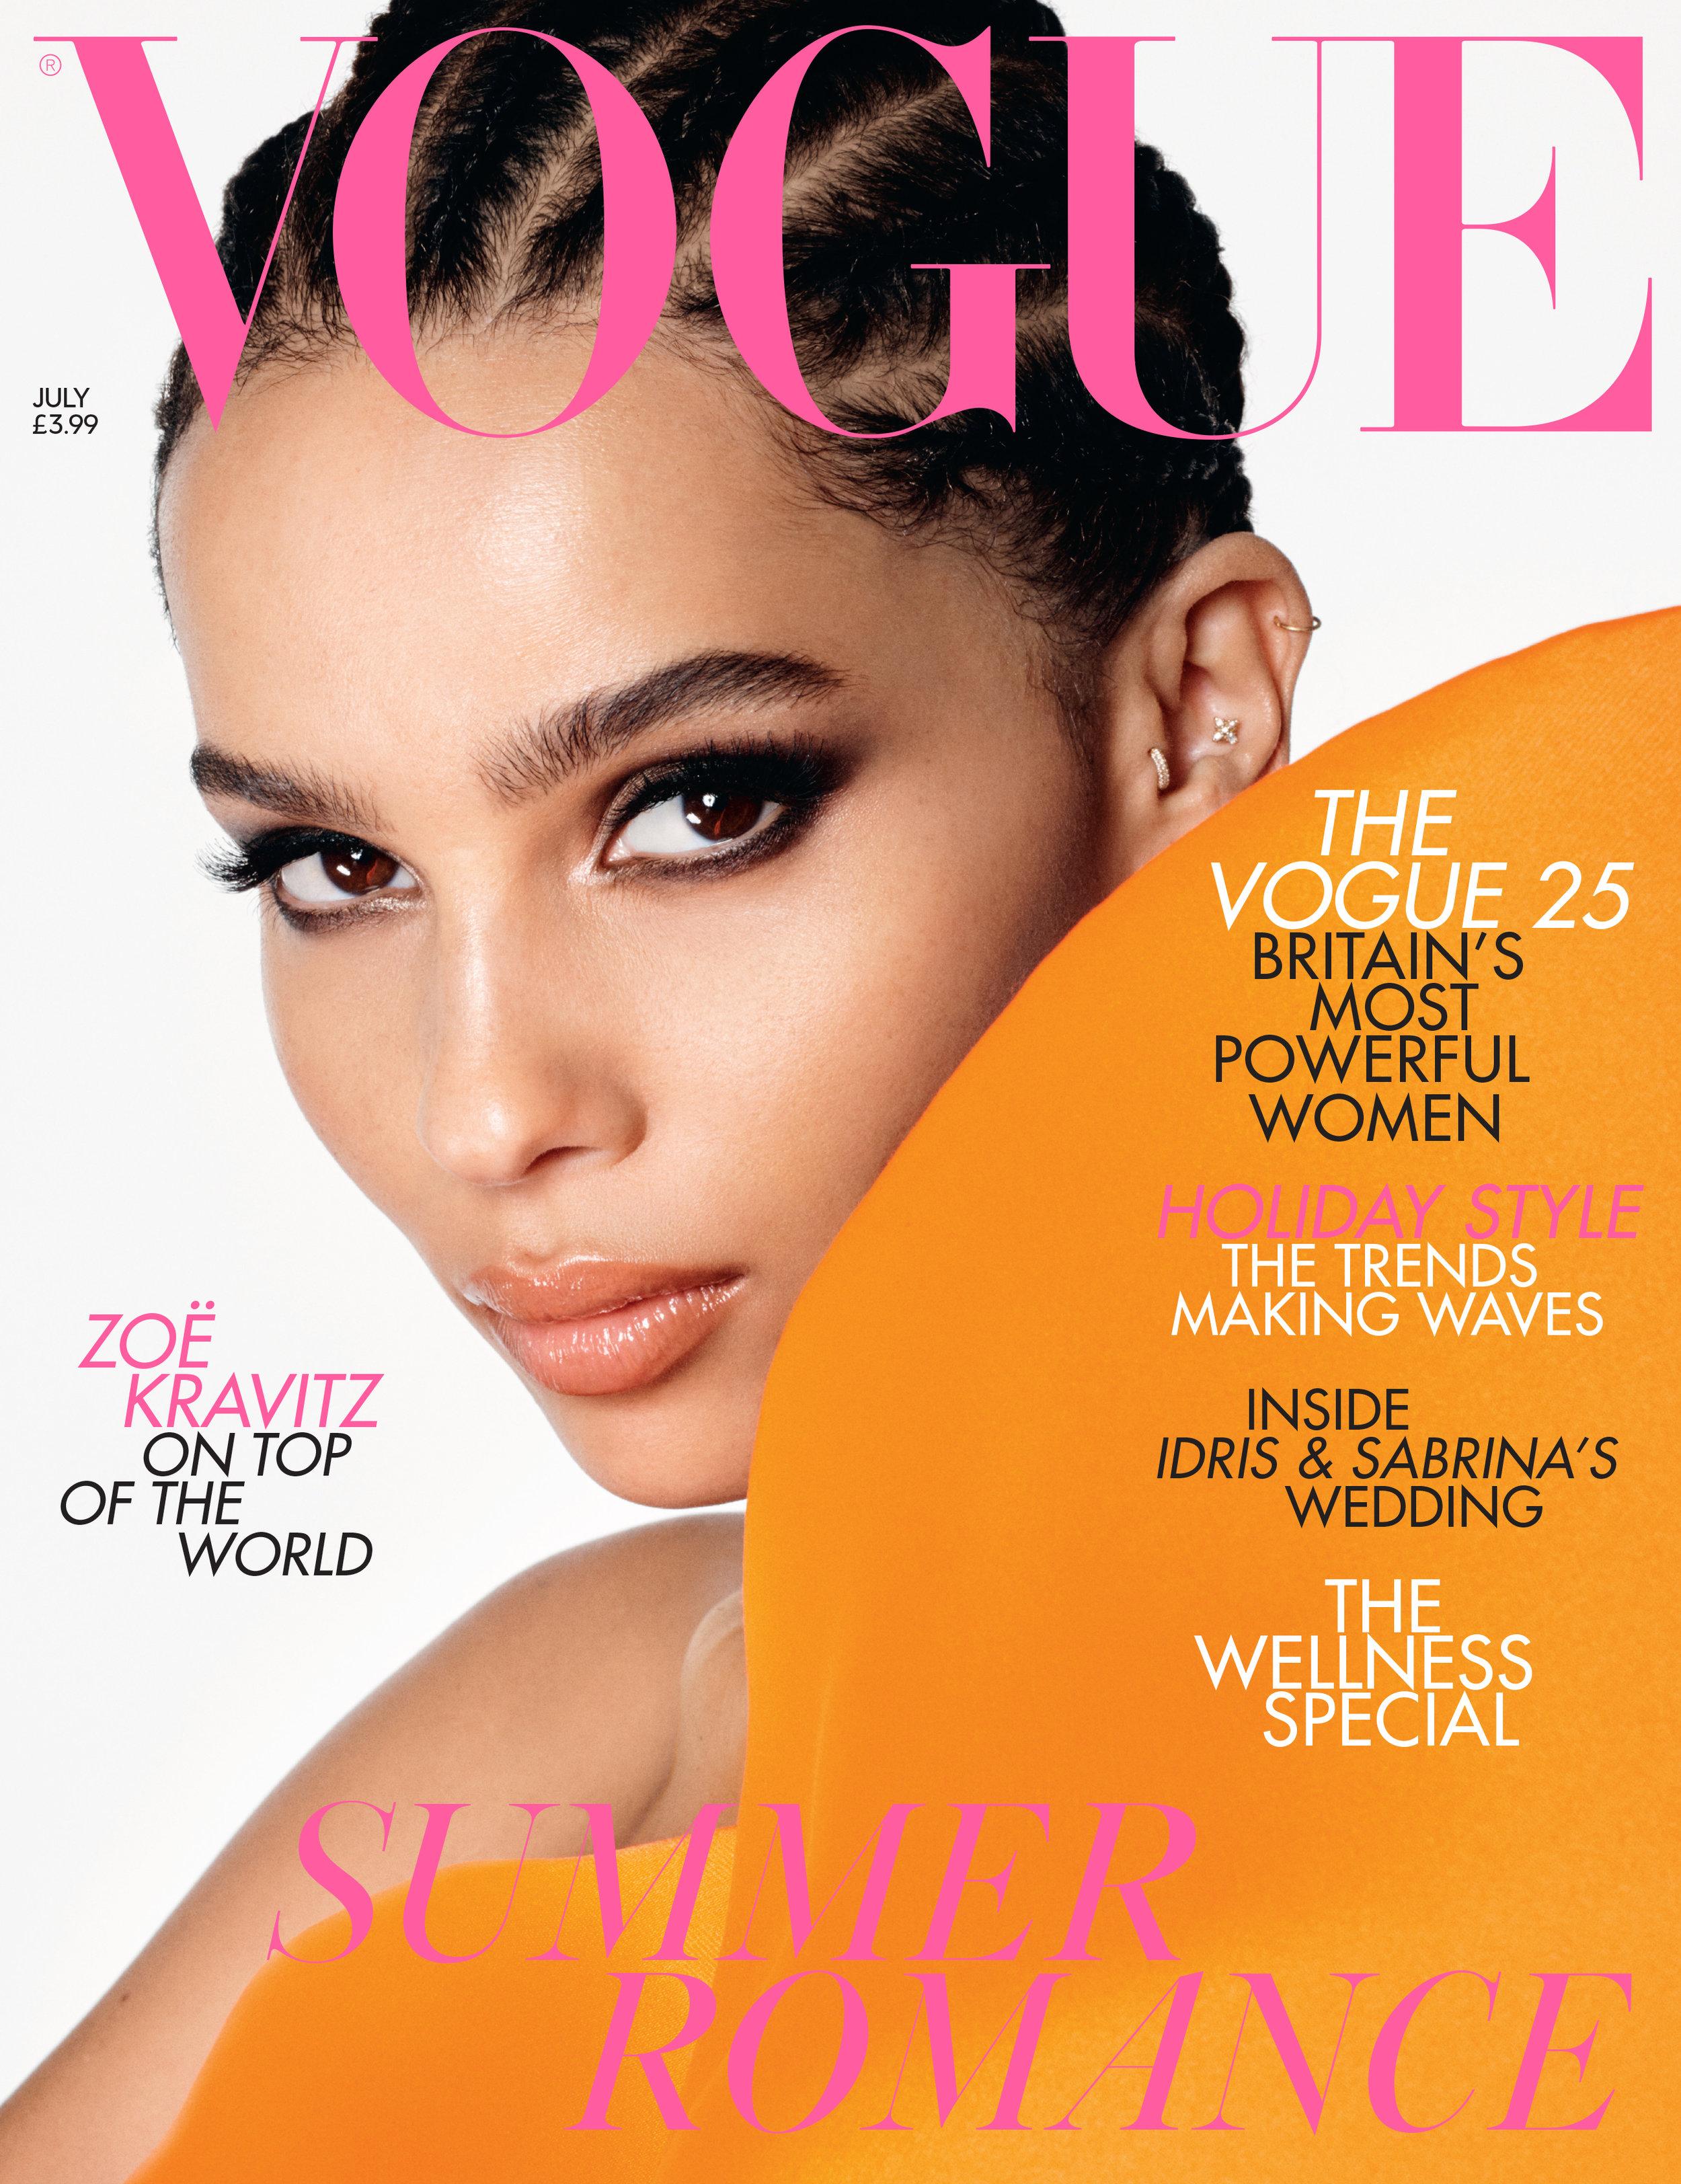 July Vogue cover Zoe Kravitz